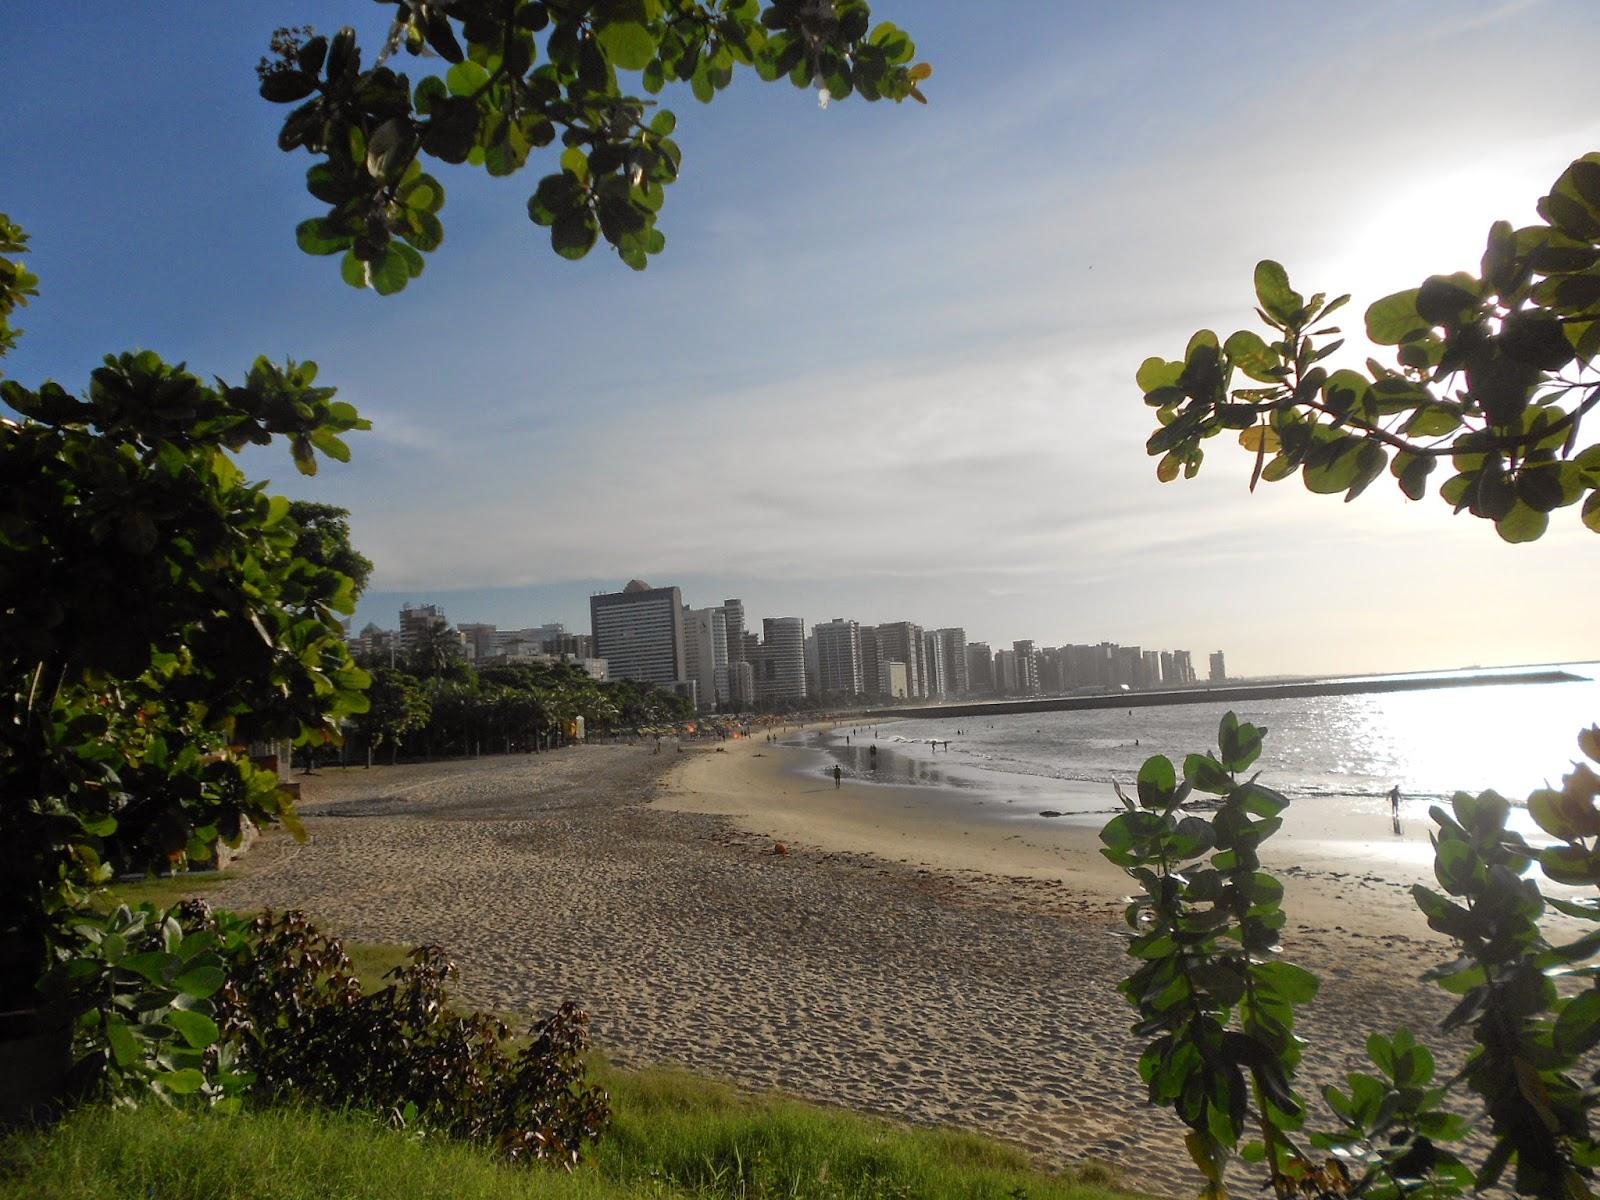 Orla da praia - Av. Beira Mar - Fortaleza